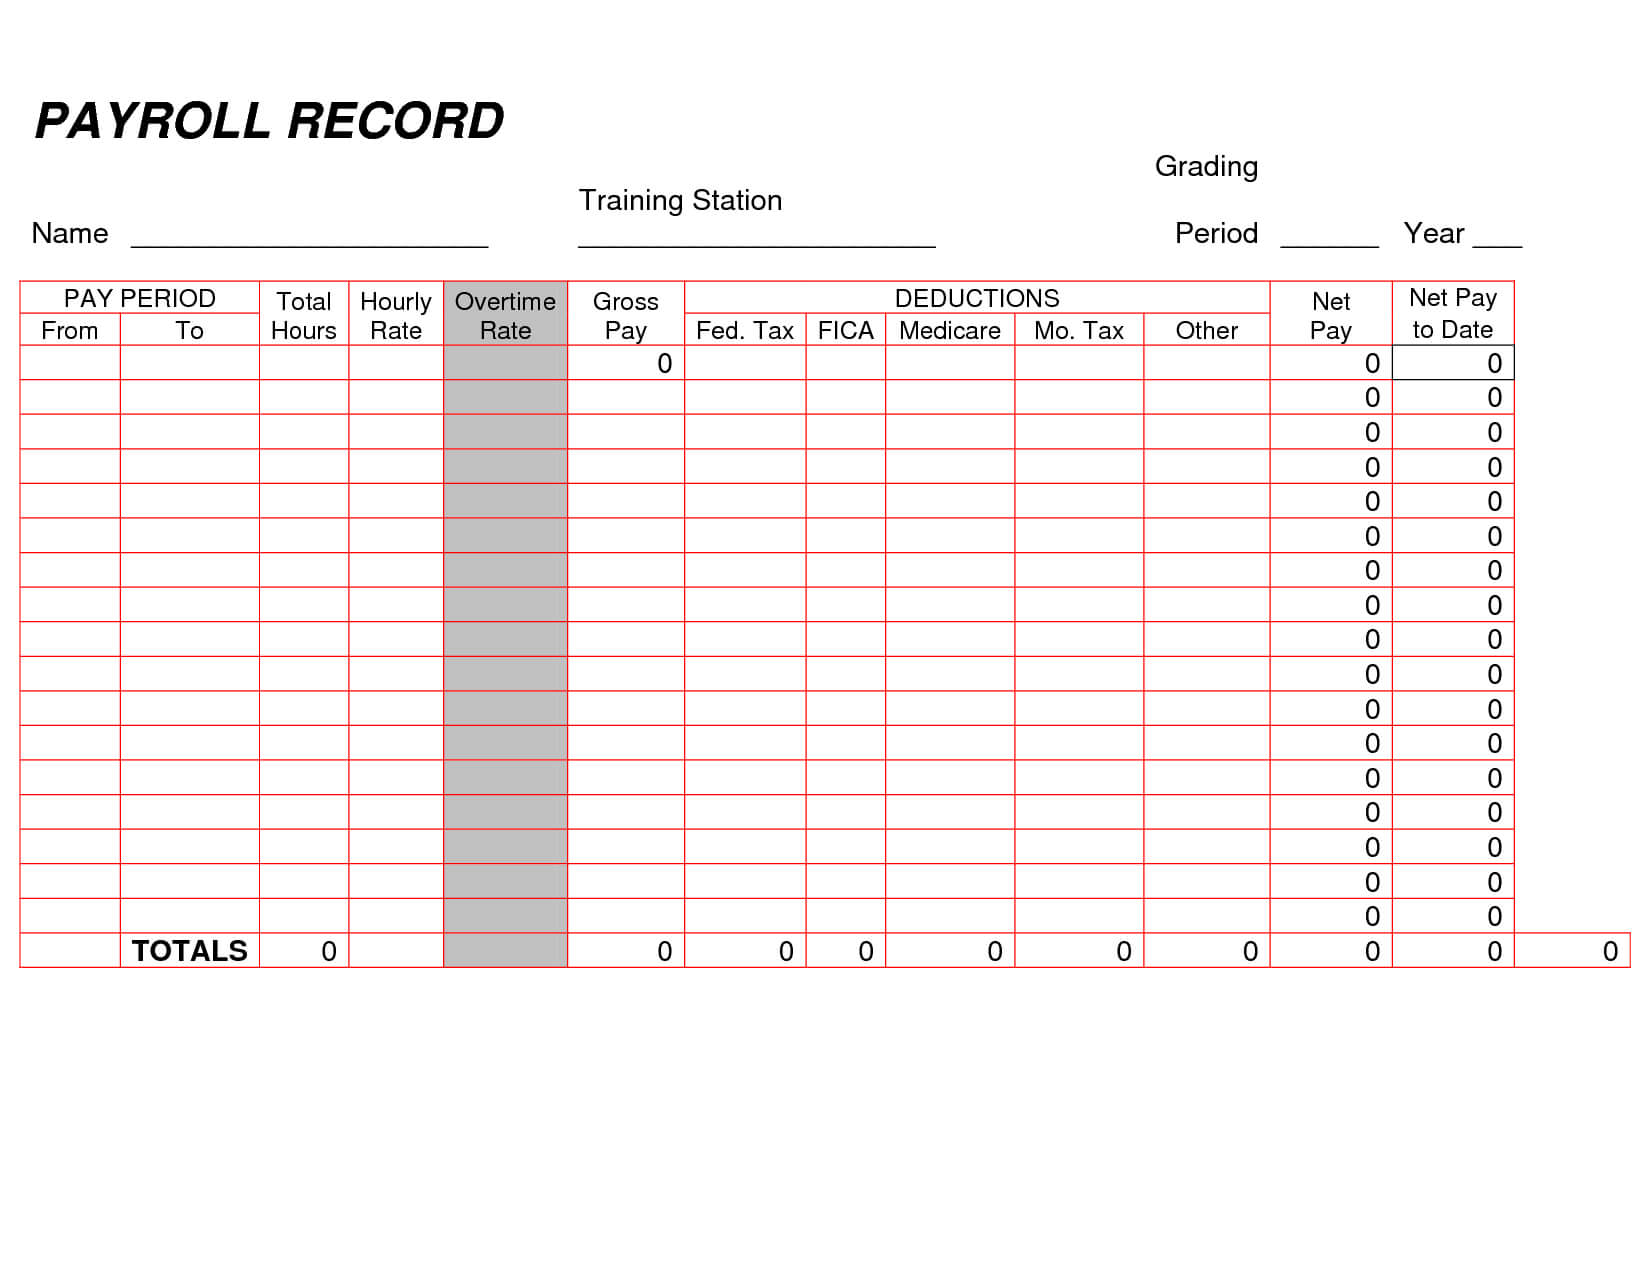 Printable Payroll Ledger | Blank Payroll Record – Pdf | Work With Regard To Blank Ledger Template